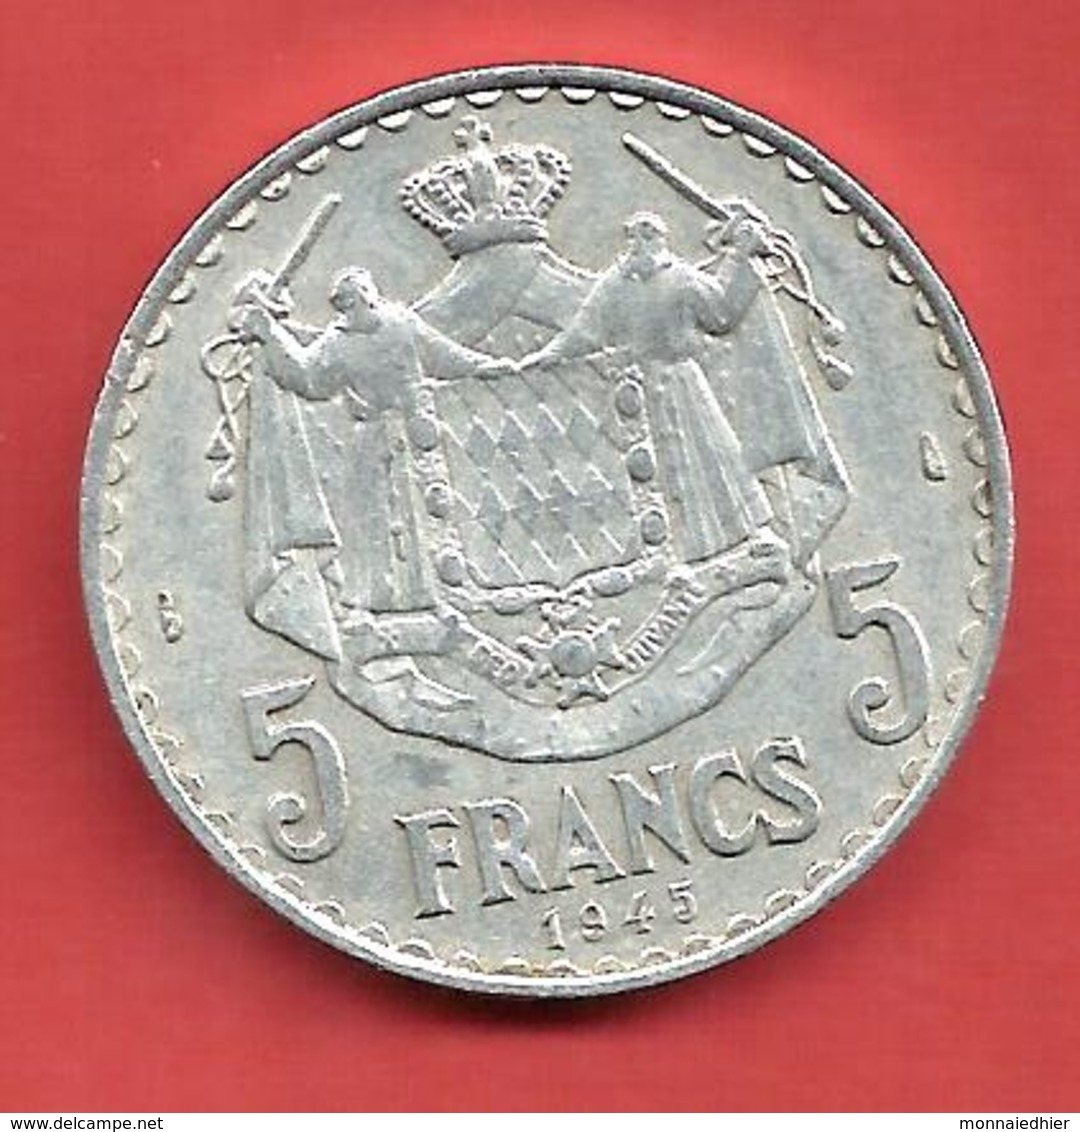 5 Francs , MONACO , Louis II , 1945 , Aluminium , N° Gadoury: 135 - Monaco